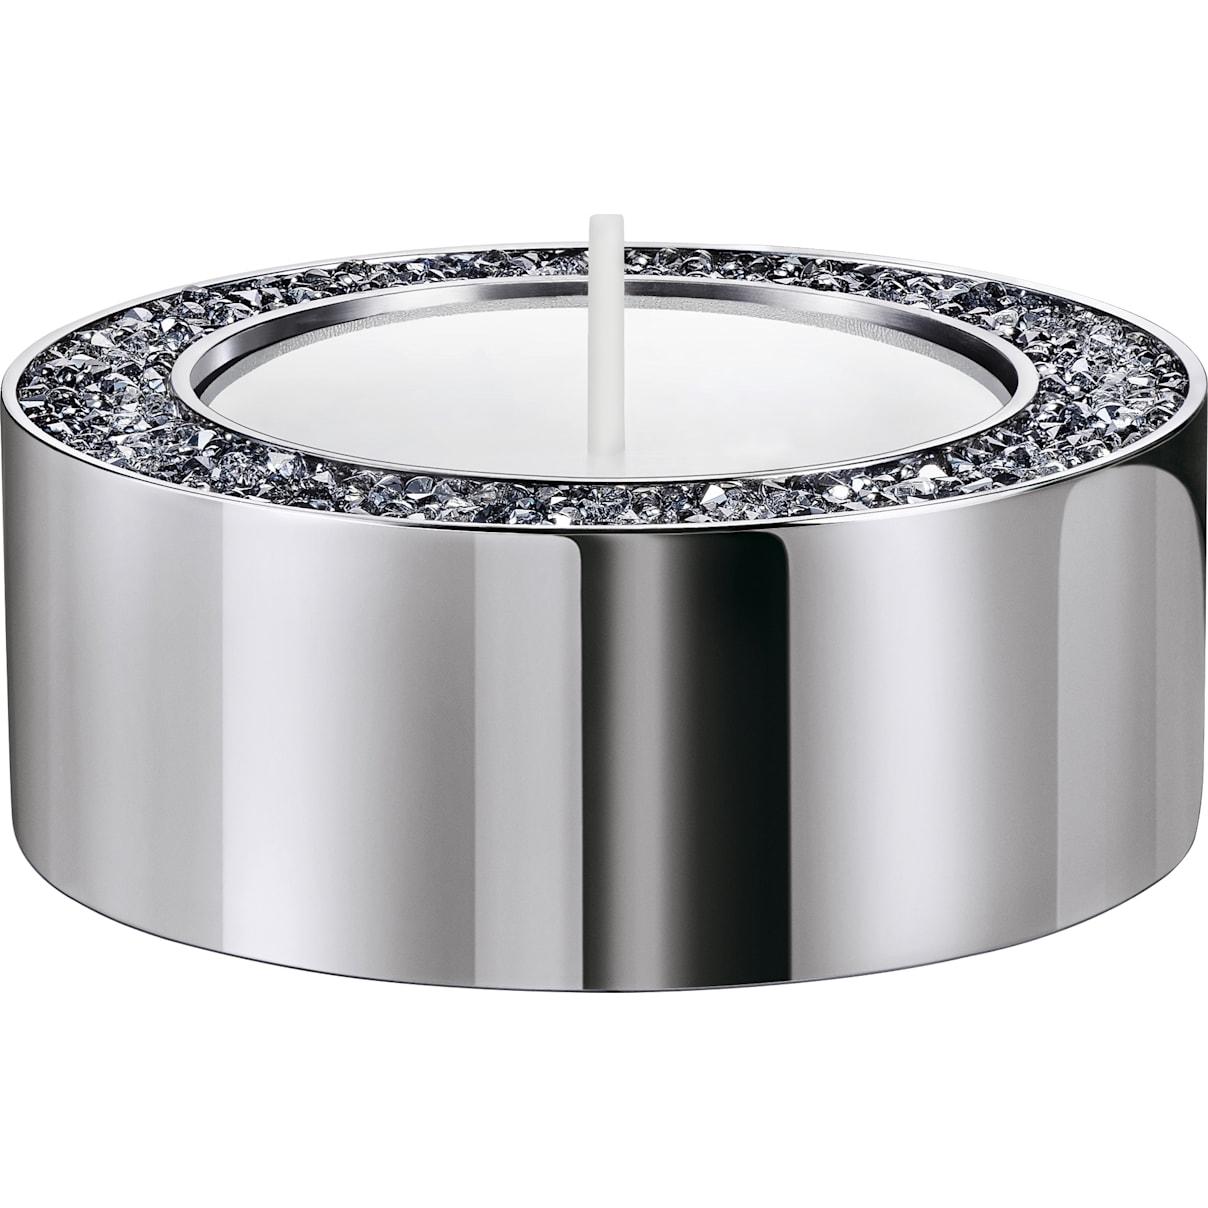 Swarovski Minera Tea Light Holder, Small, Silver tone